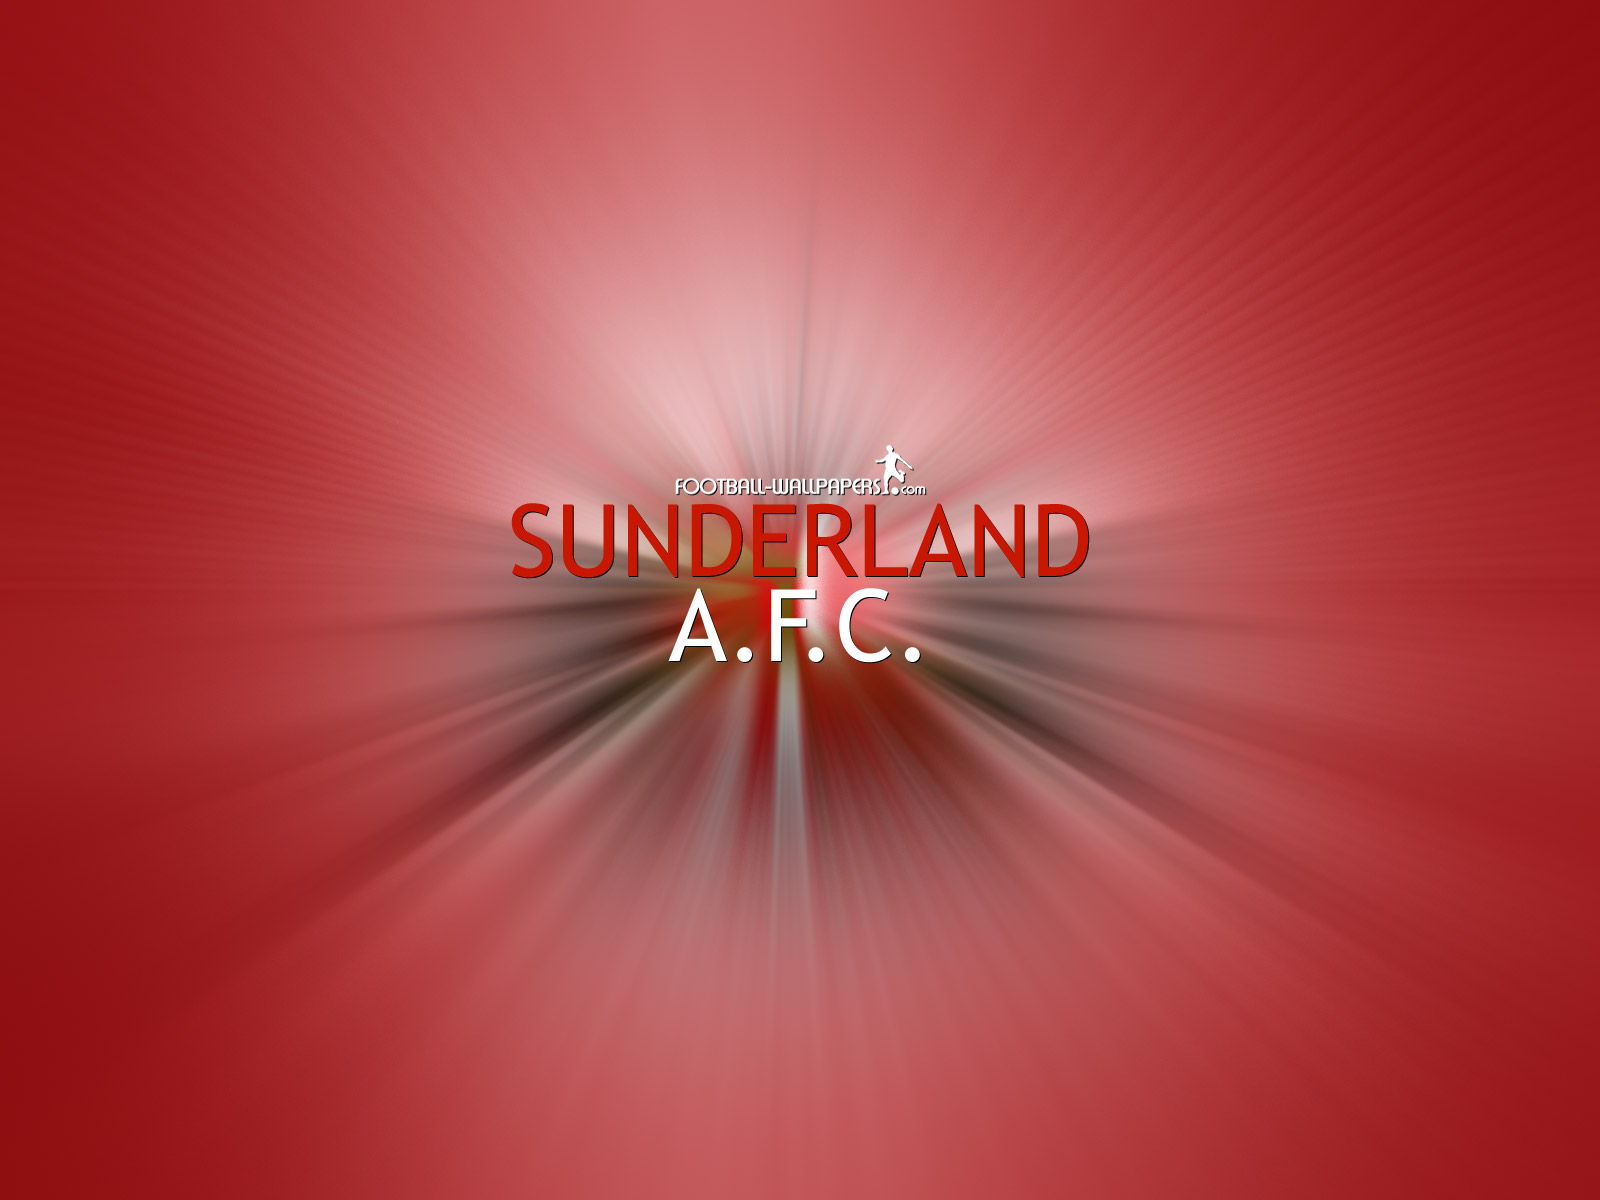 http://1.bp.blogspot.com/-hOcH5lnPEz0/Th1tg1OzpUI/AAAAAAAABDo/EXOYsTjPDHc/s1600/Sunderland+Wallpaper+3.jpg